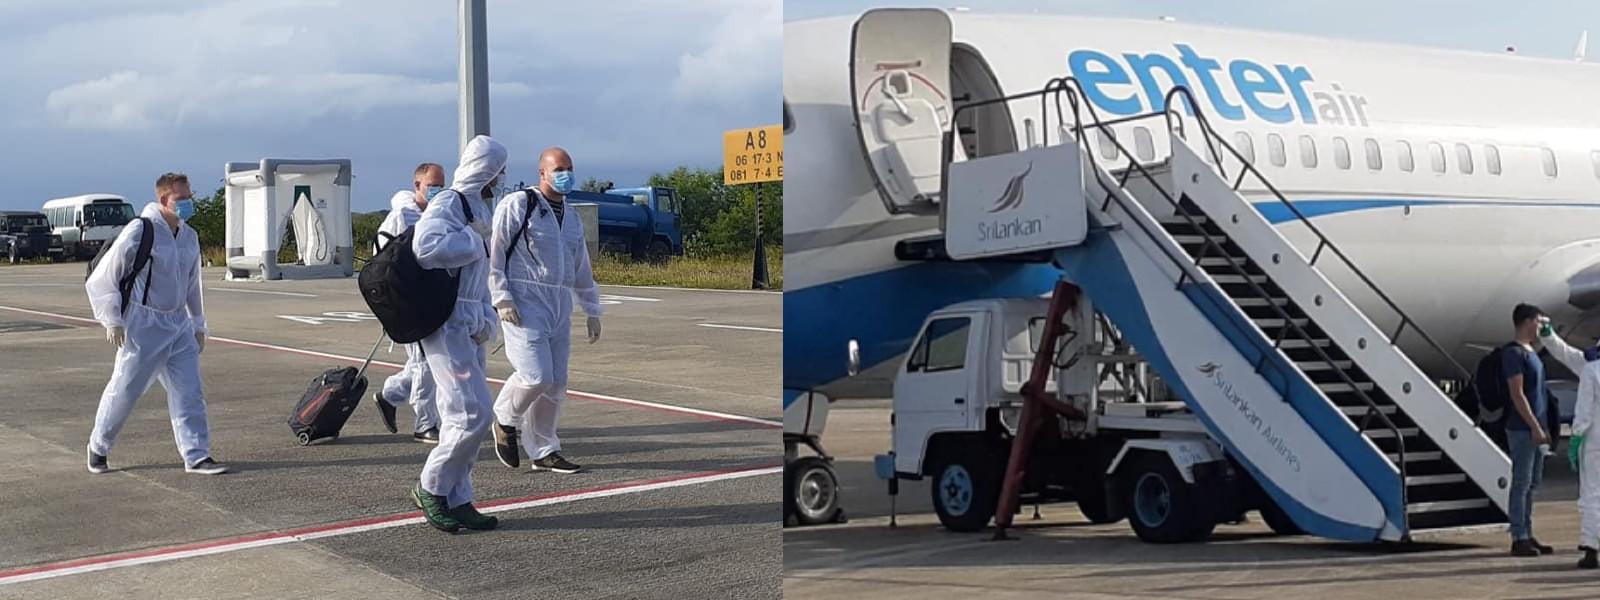 Crew transfer flight from Belgium lands at the MRIA